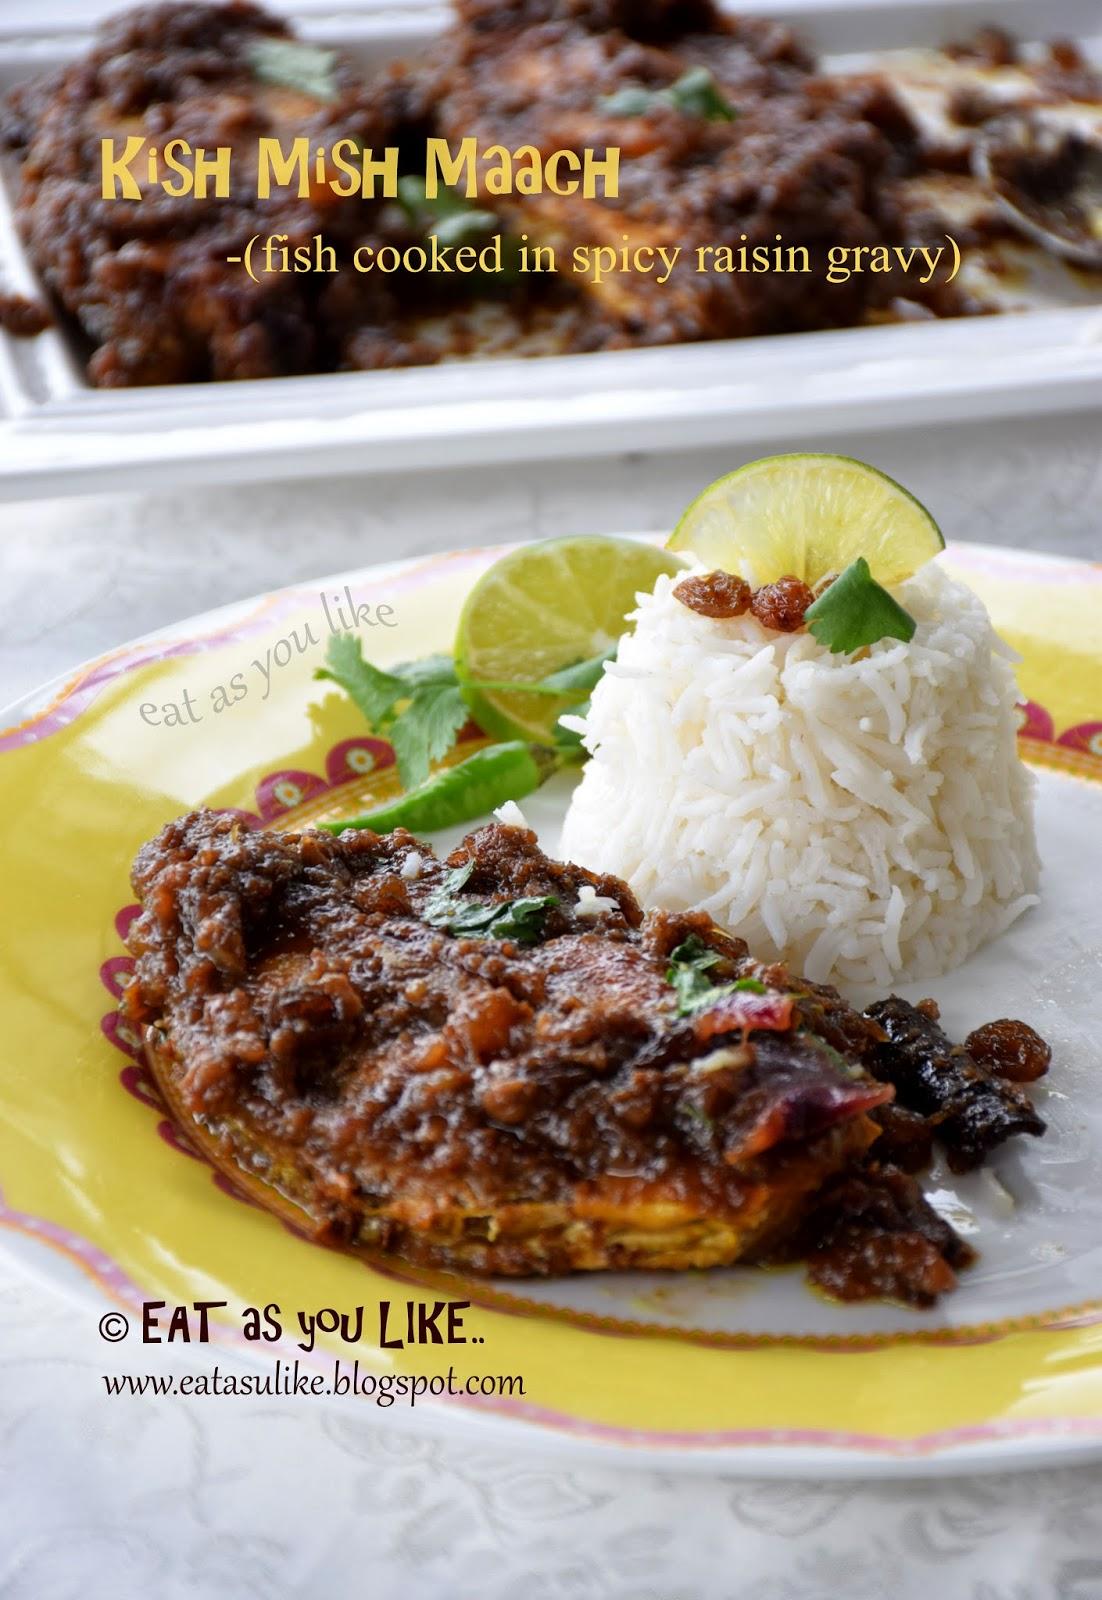 http://eatasulike.blogspot.com.au/2014/03/kish-mish-maach-fish-in-raisin-gravy.html